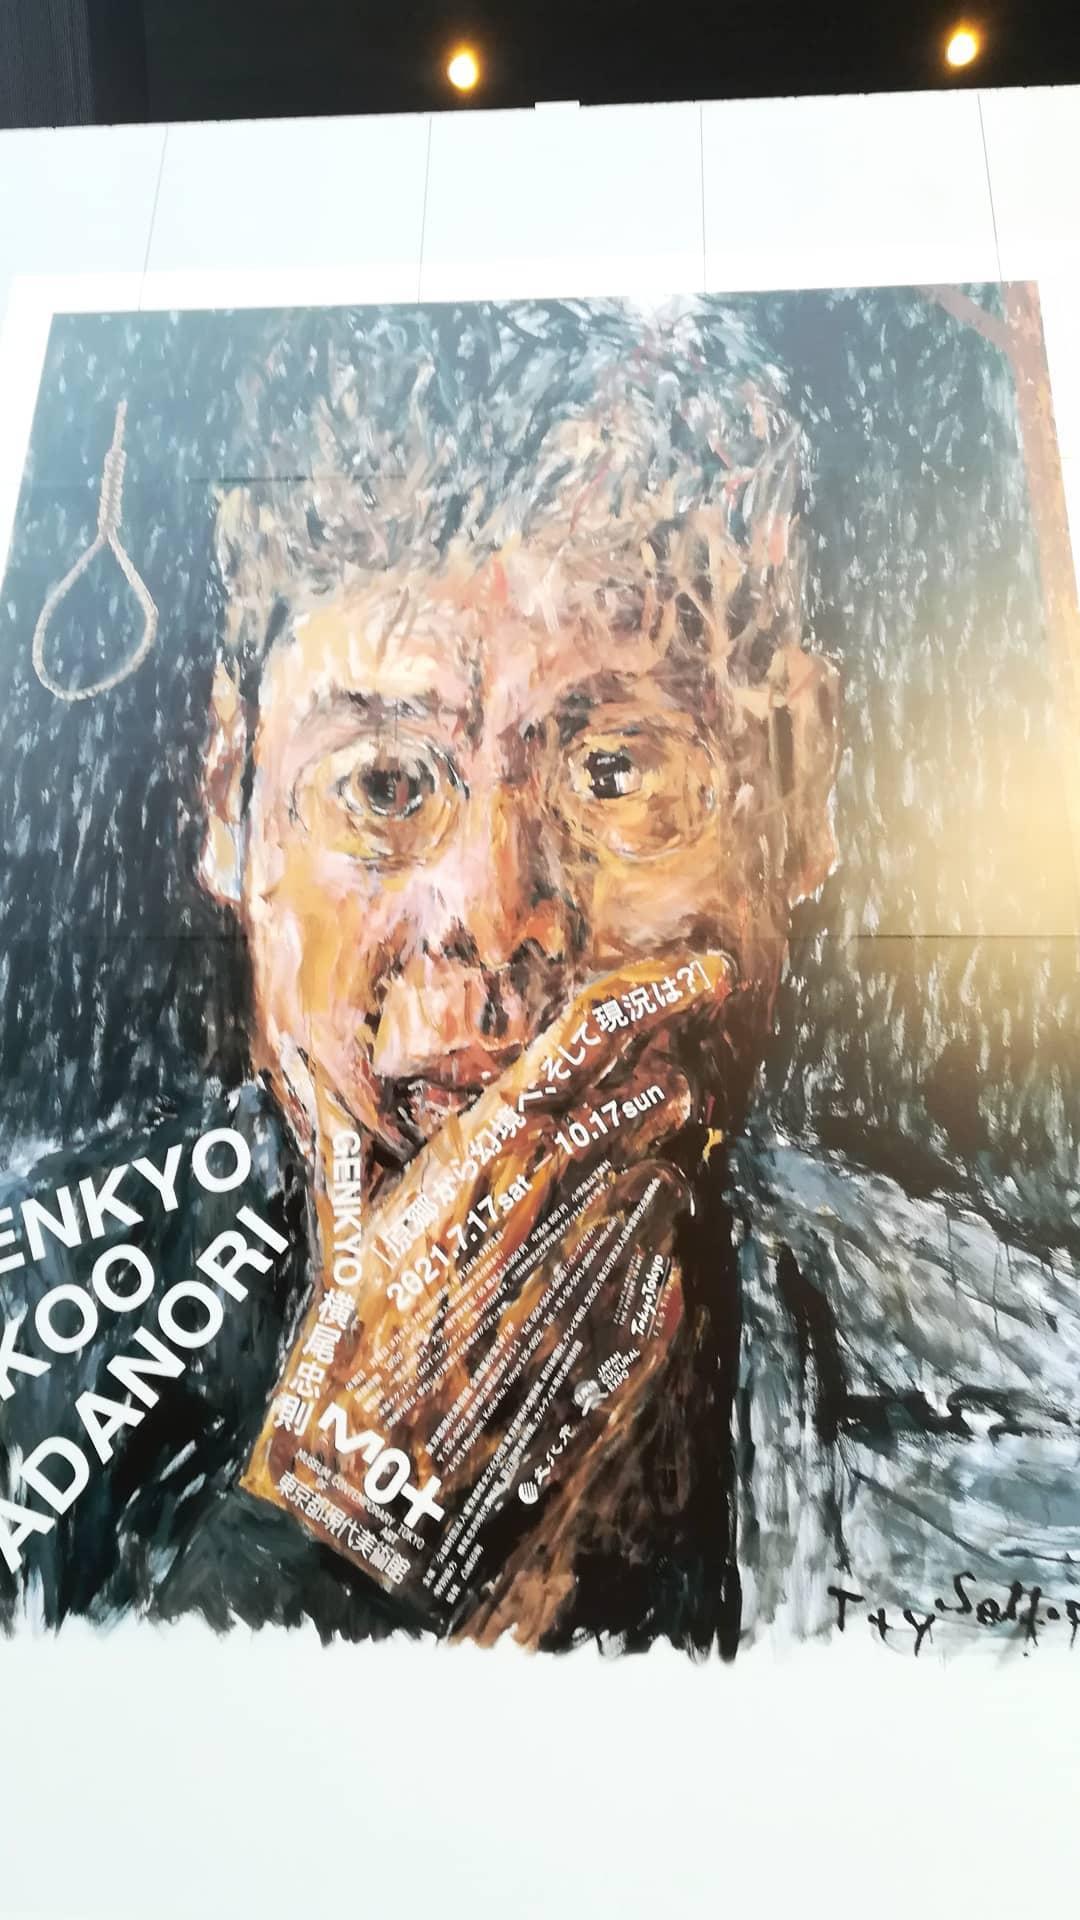 『GENKYO 横尾忠則  原郷から幻境へ、そして現況は?』感想、レビュー、あらすじ、ネタバレ